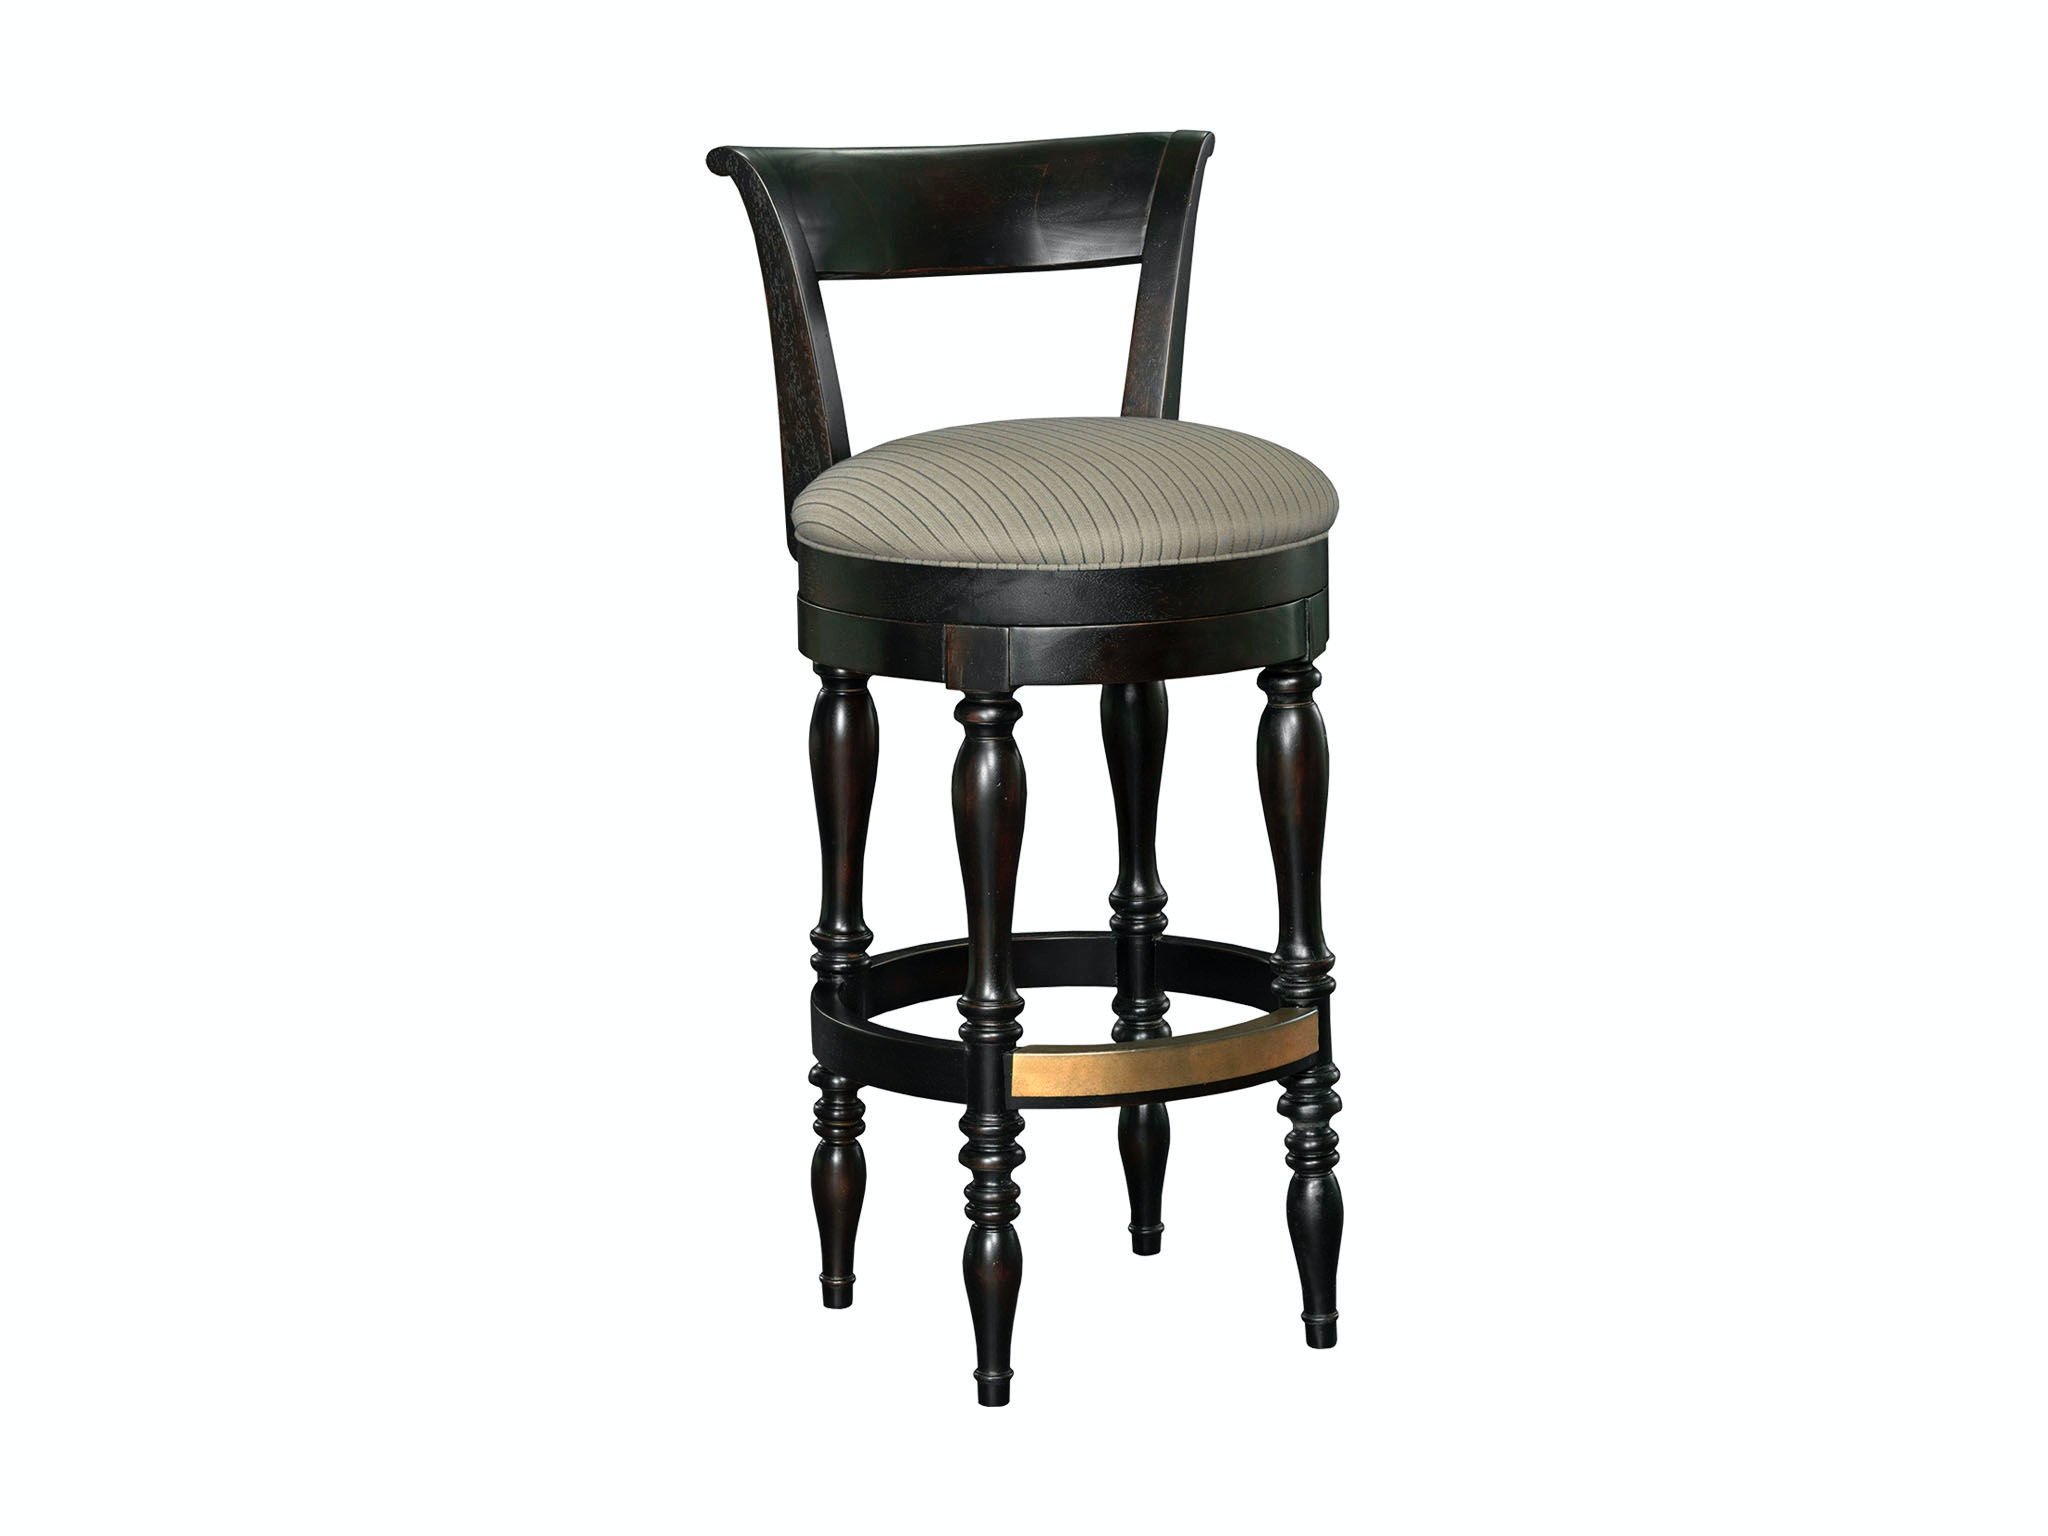 Drexel Heritage Dining Room Tribute Bar Stool 587 789  : 587 789 from www.alysonjon.com size 1024 x 768 jpeg 25kB